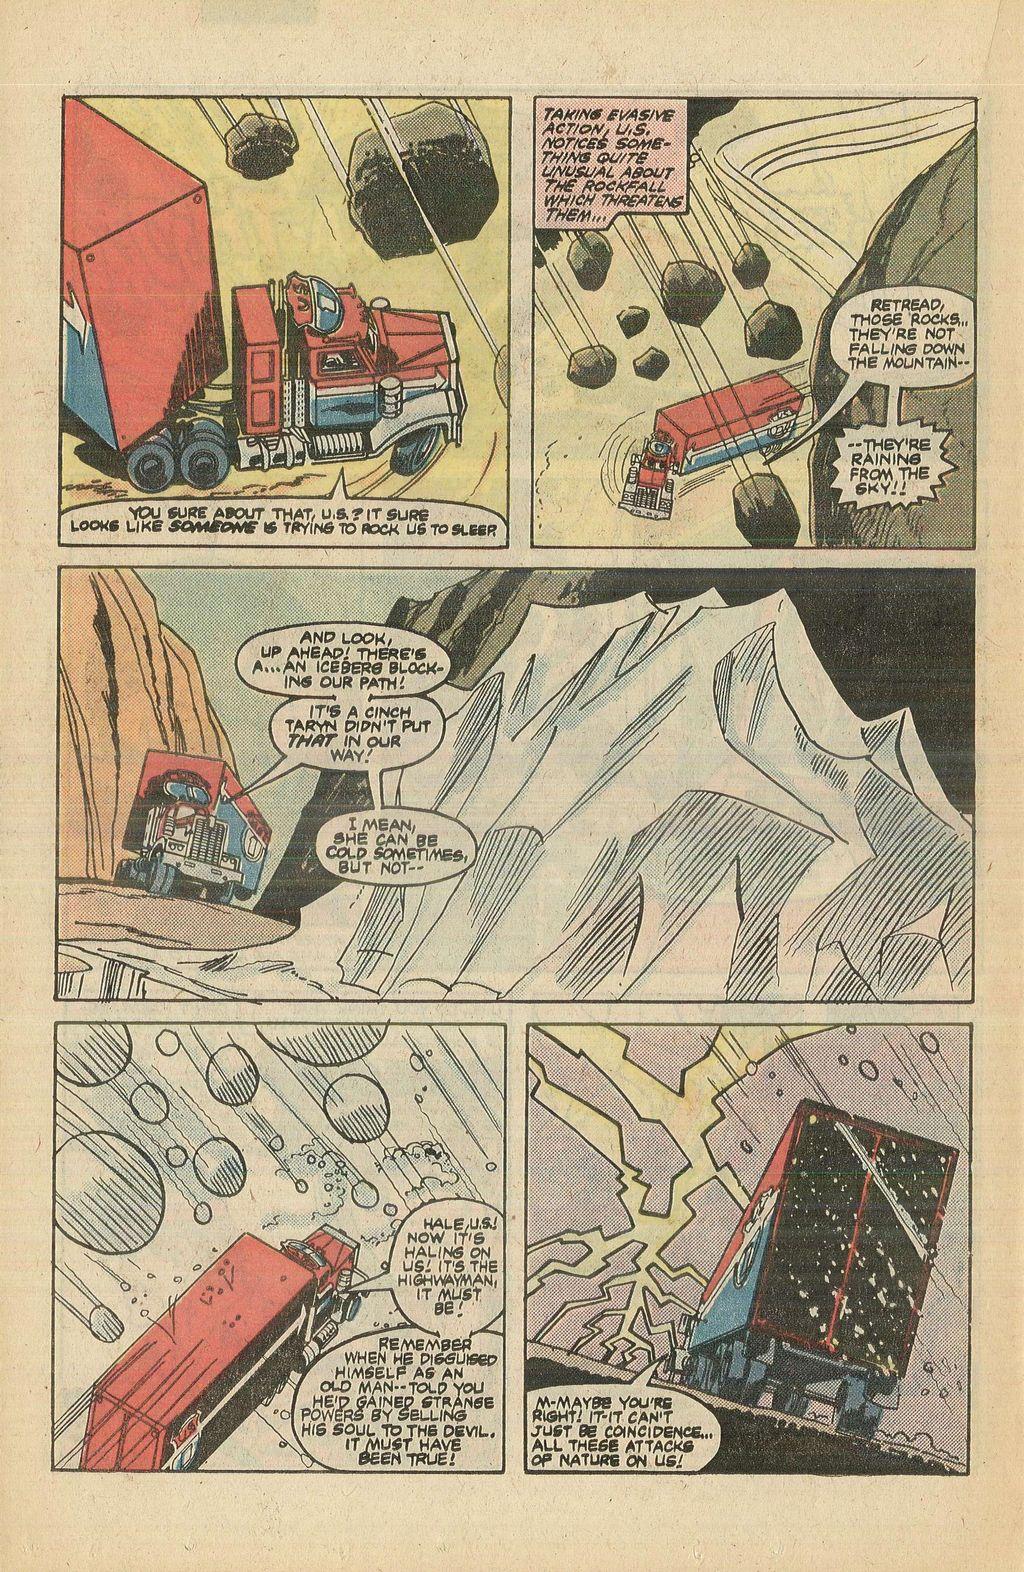 Read online U.S. 1 comic -  Issue #5 - 14